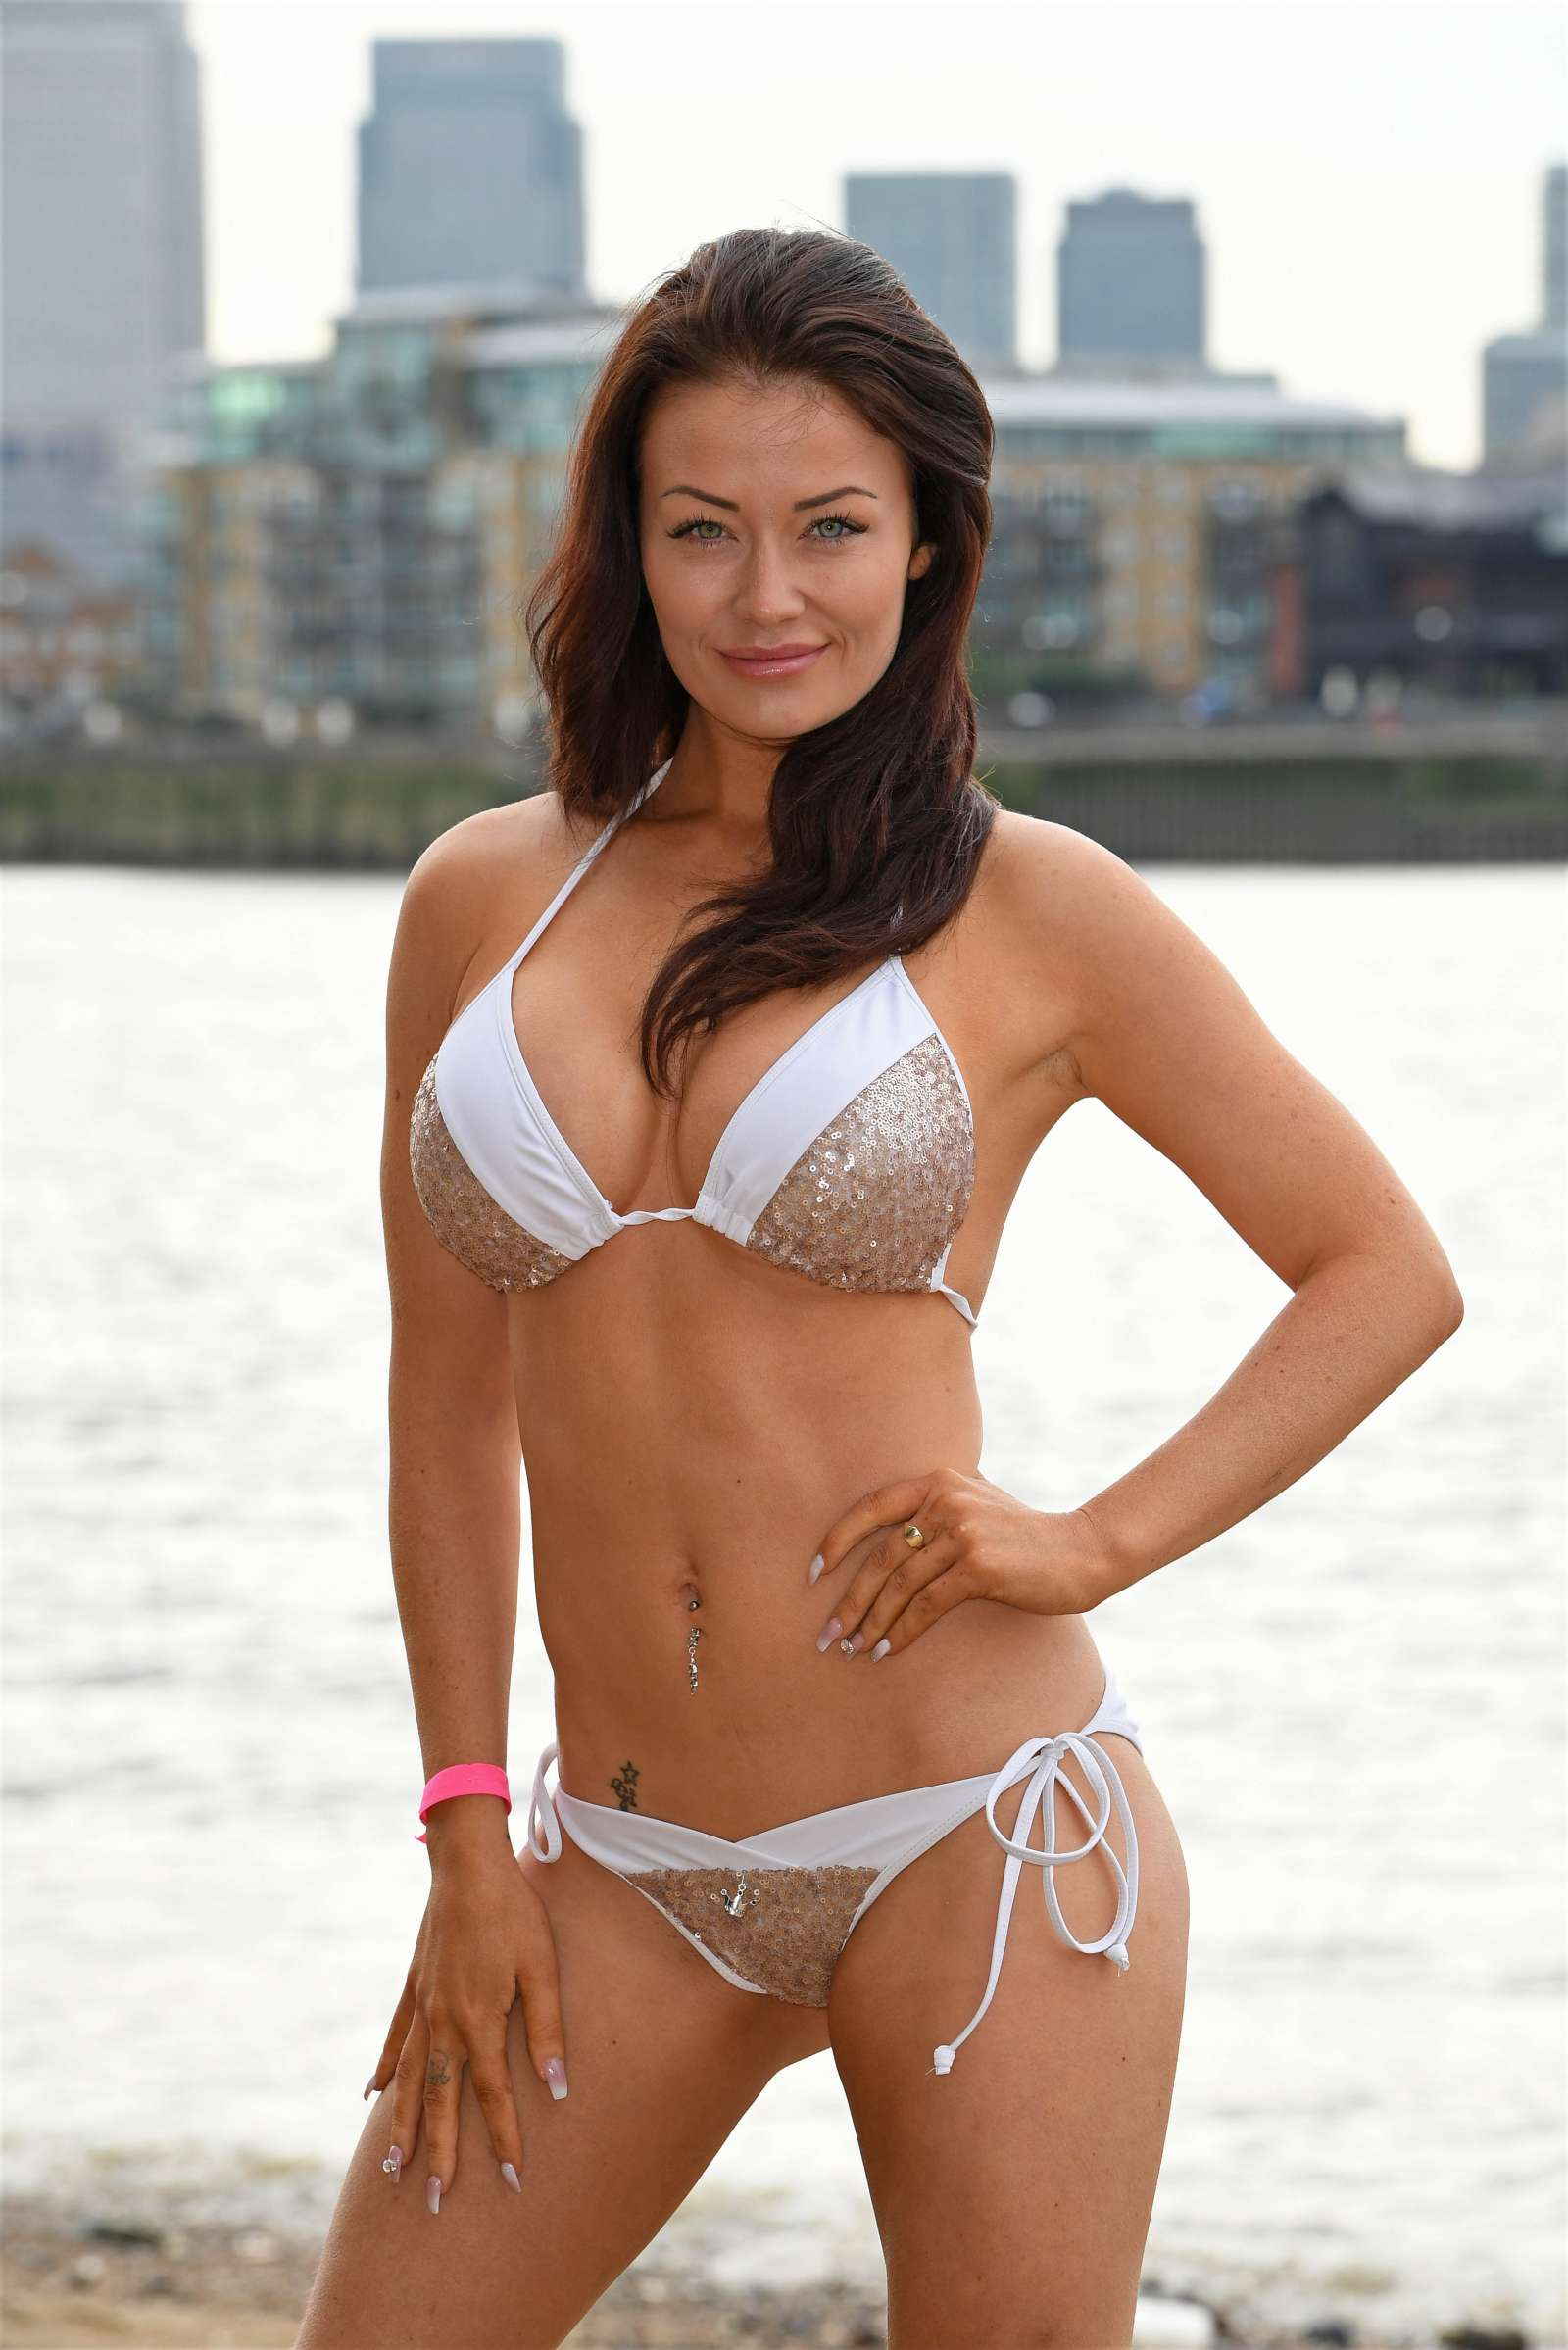 Bikini bistro photos